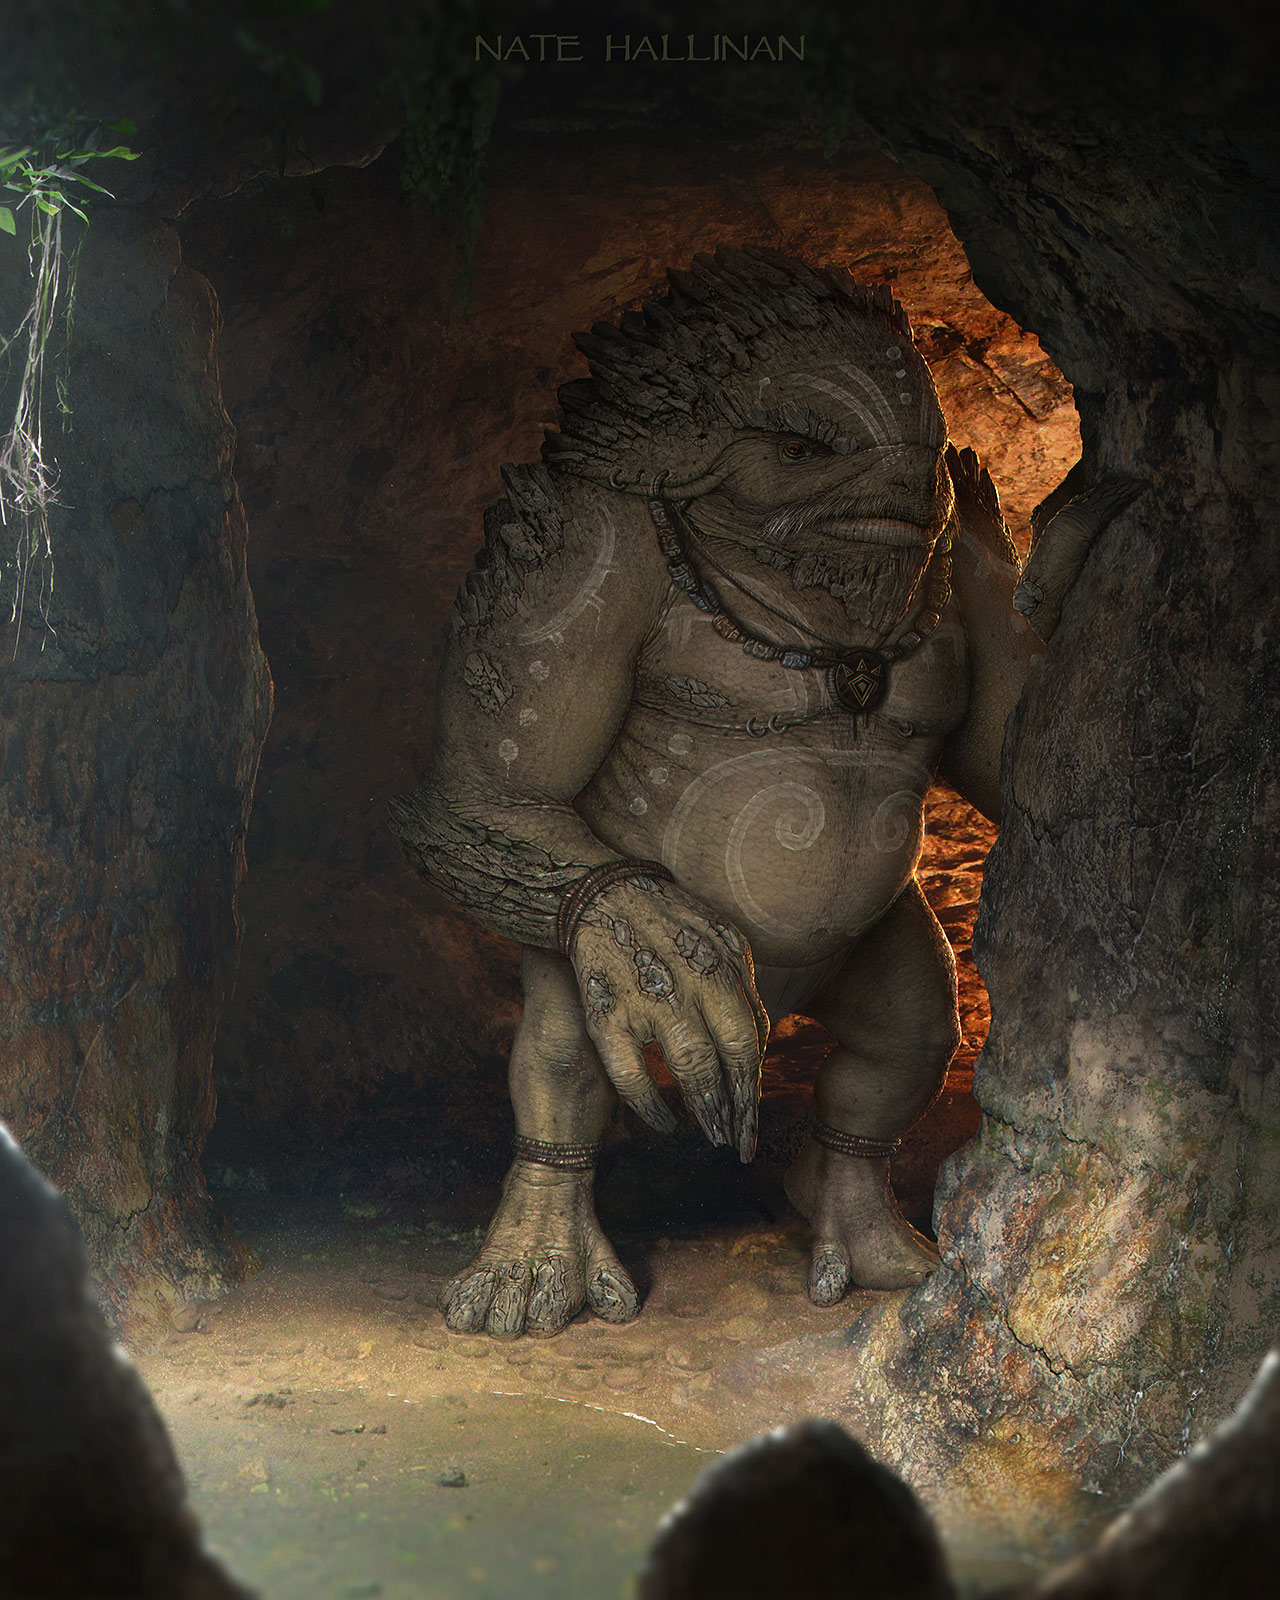 Innate goron cave guard 1 a1a2bdea 25hk